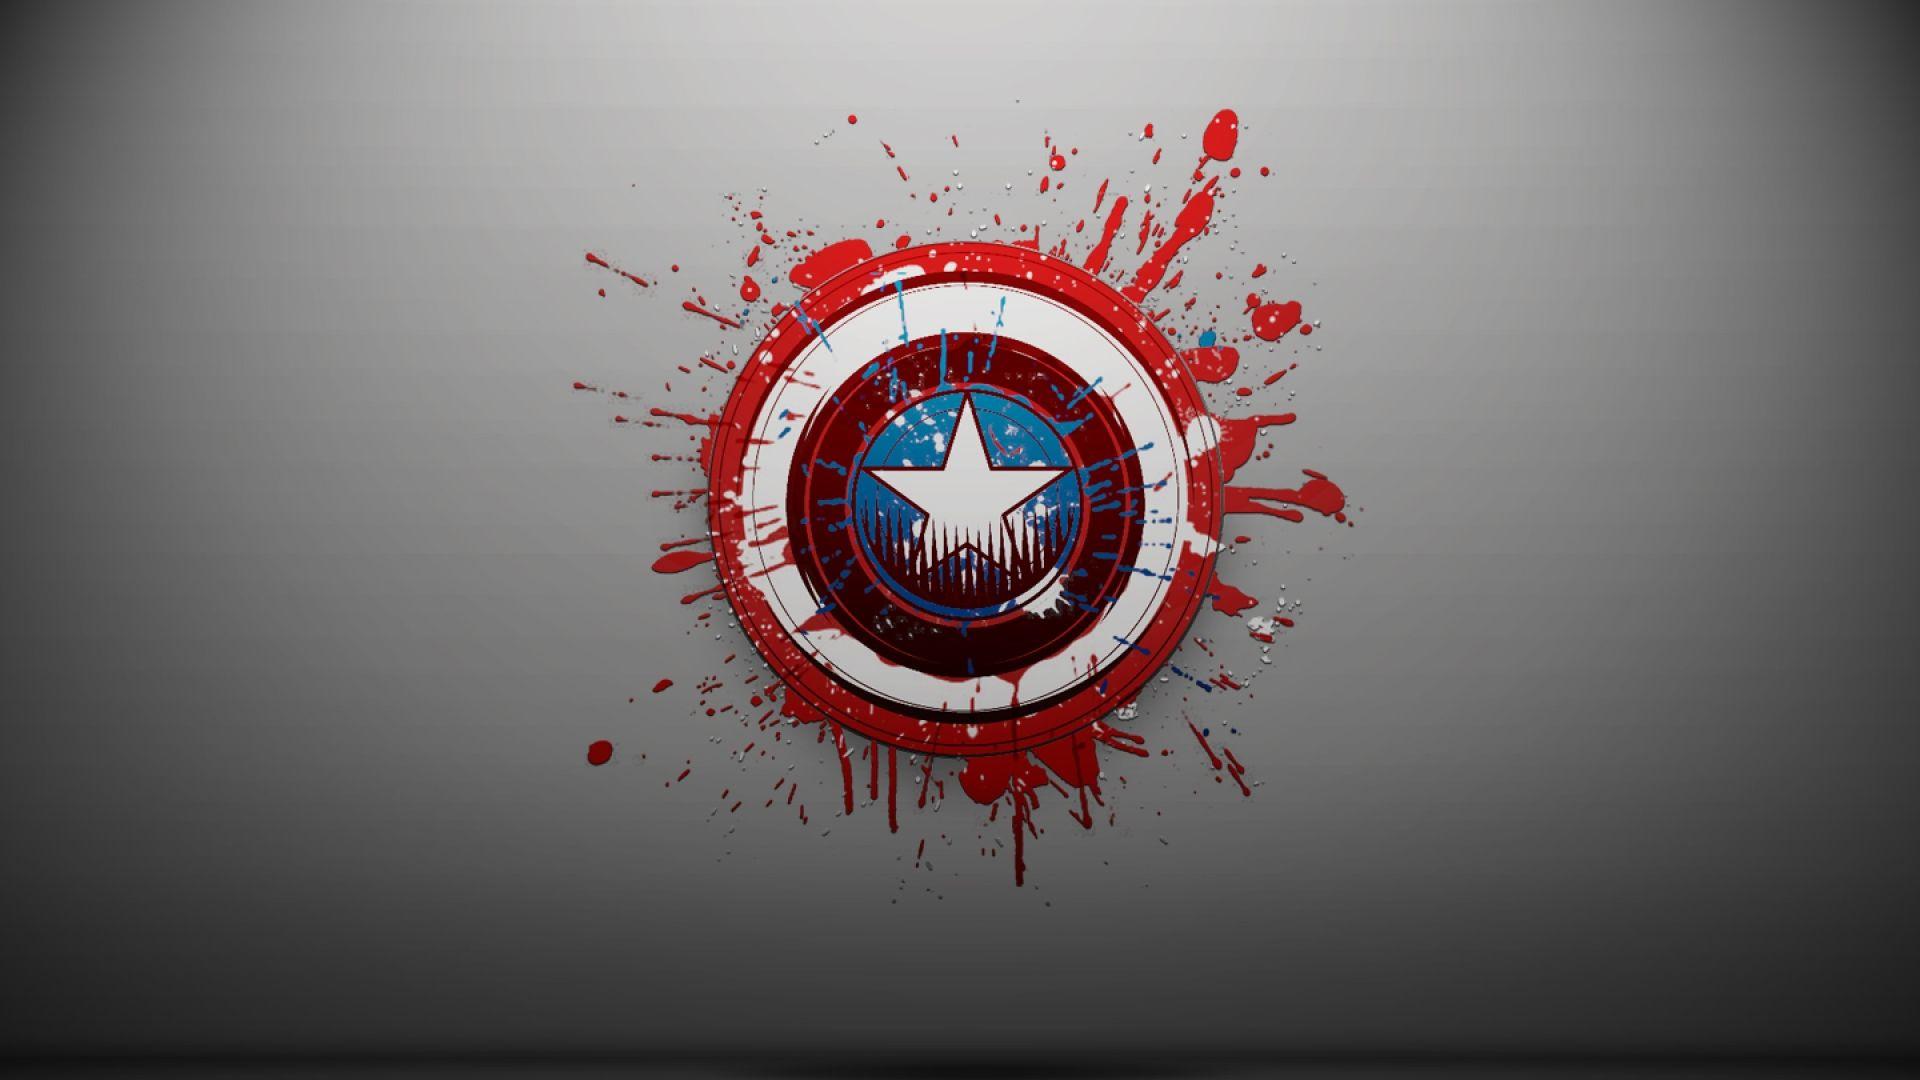 Captain America Cool Hd Wallpaper R Wallpapers Captain America Shield Wallpaper Captain America Wallpaper Creative Graphics